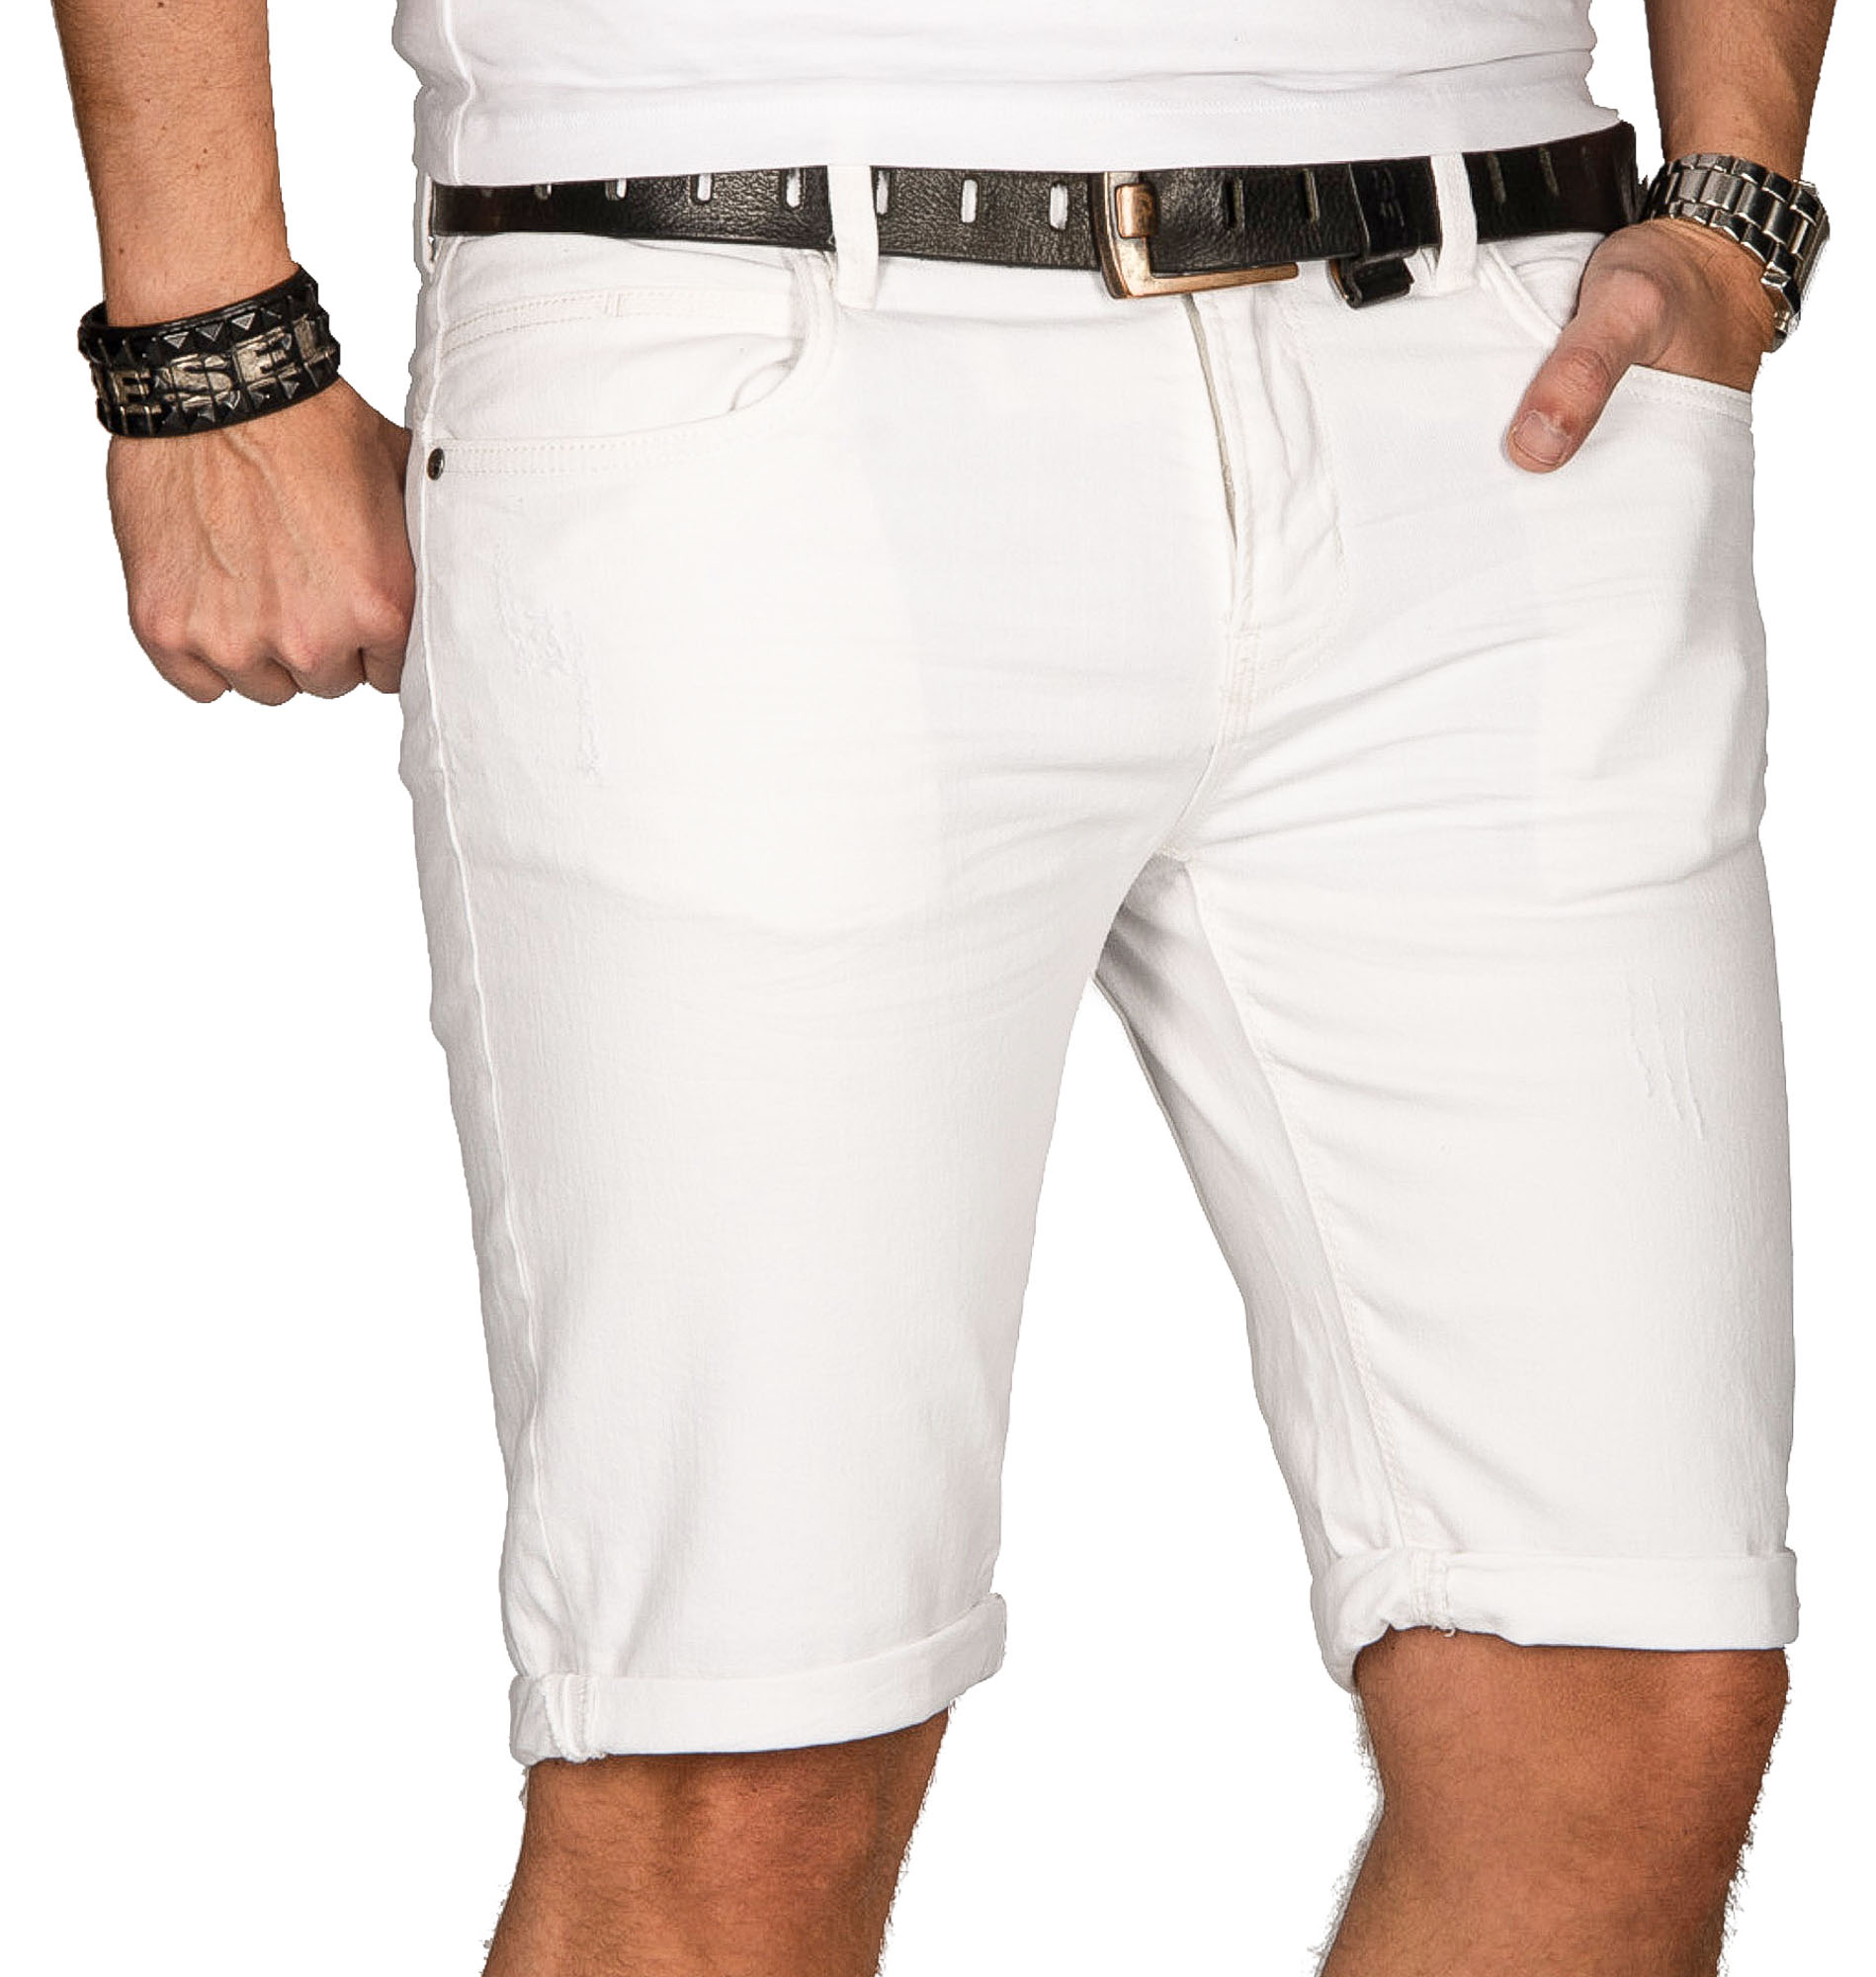 Indicode-Herren-Sommer-Bermuda-Jeans-Shorts-kurze-Hose-Sommerhose-Short-Neu-B556 Indexbild 15